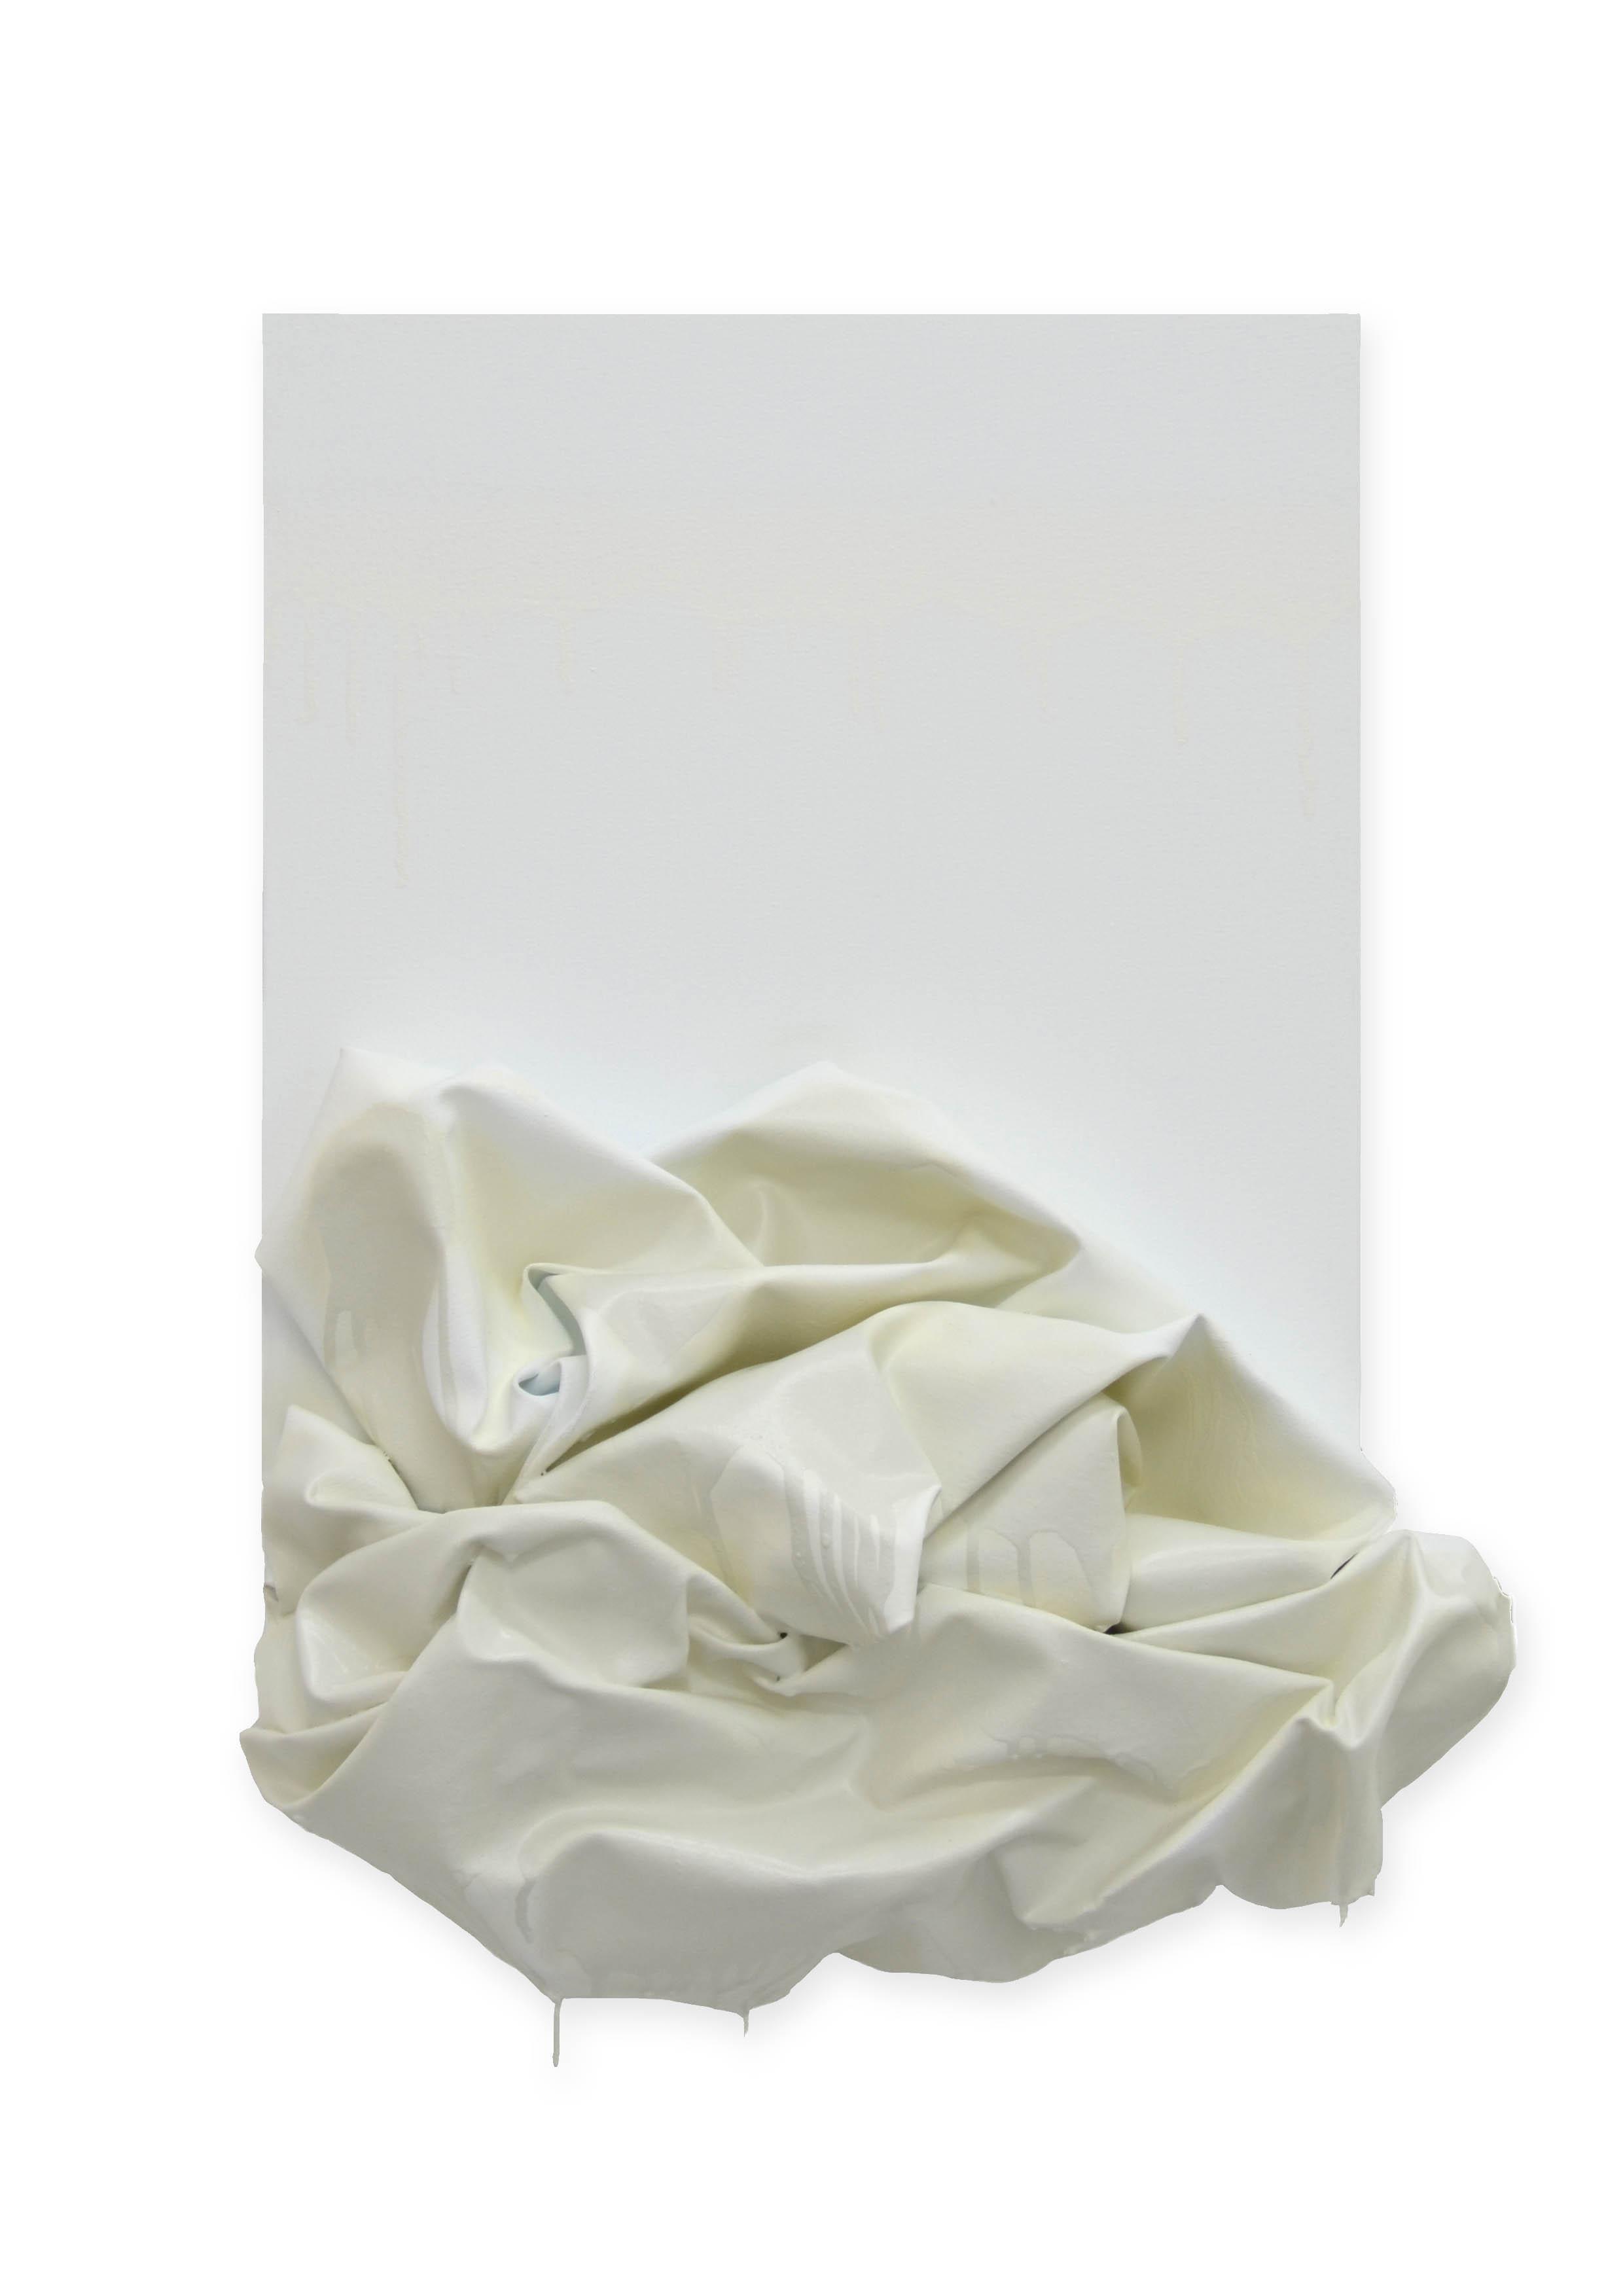 Descending  - 2017  Pigmento acrilico e bomboletta spray su tela tesa su tavola  50 x 40 cm